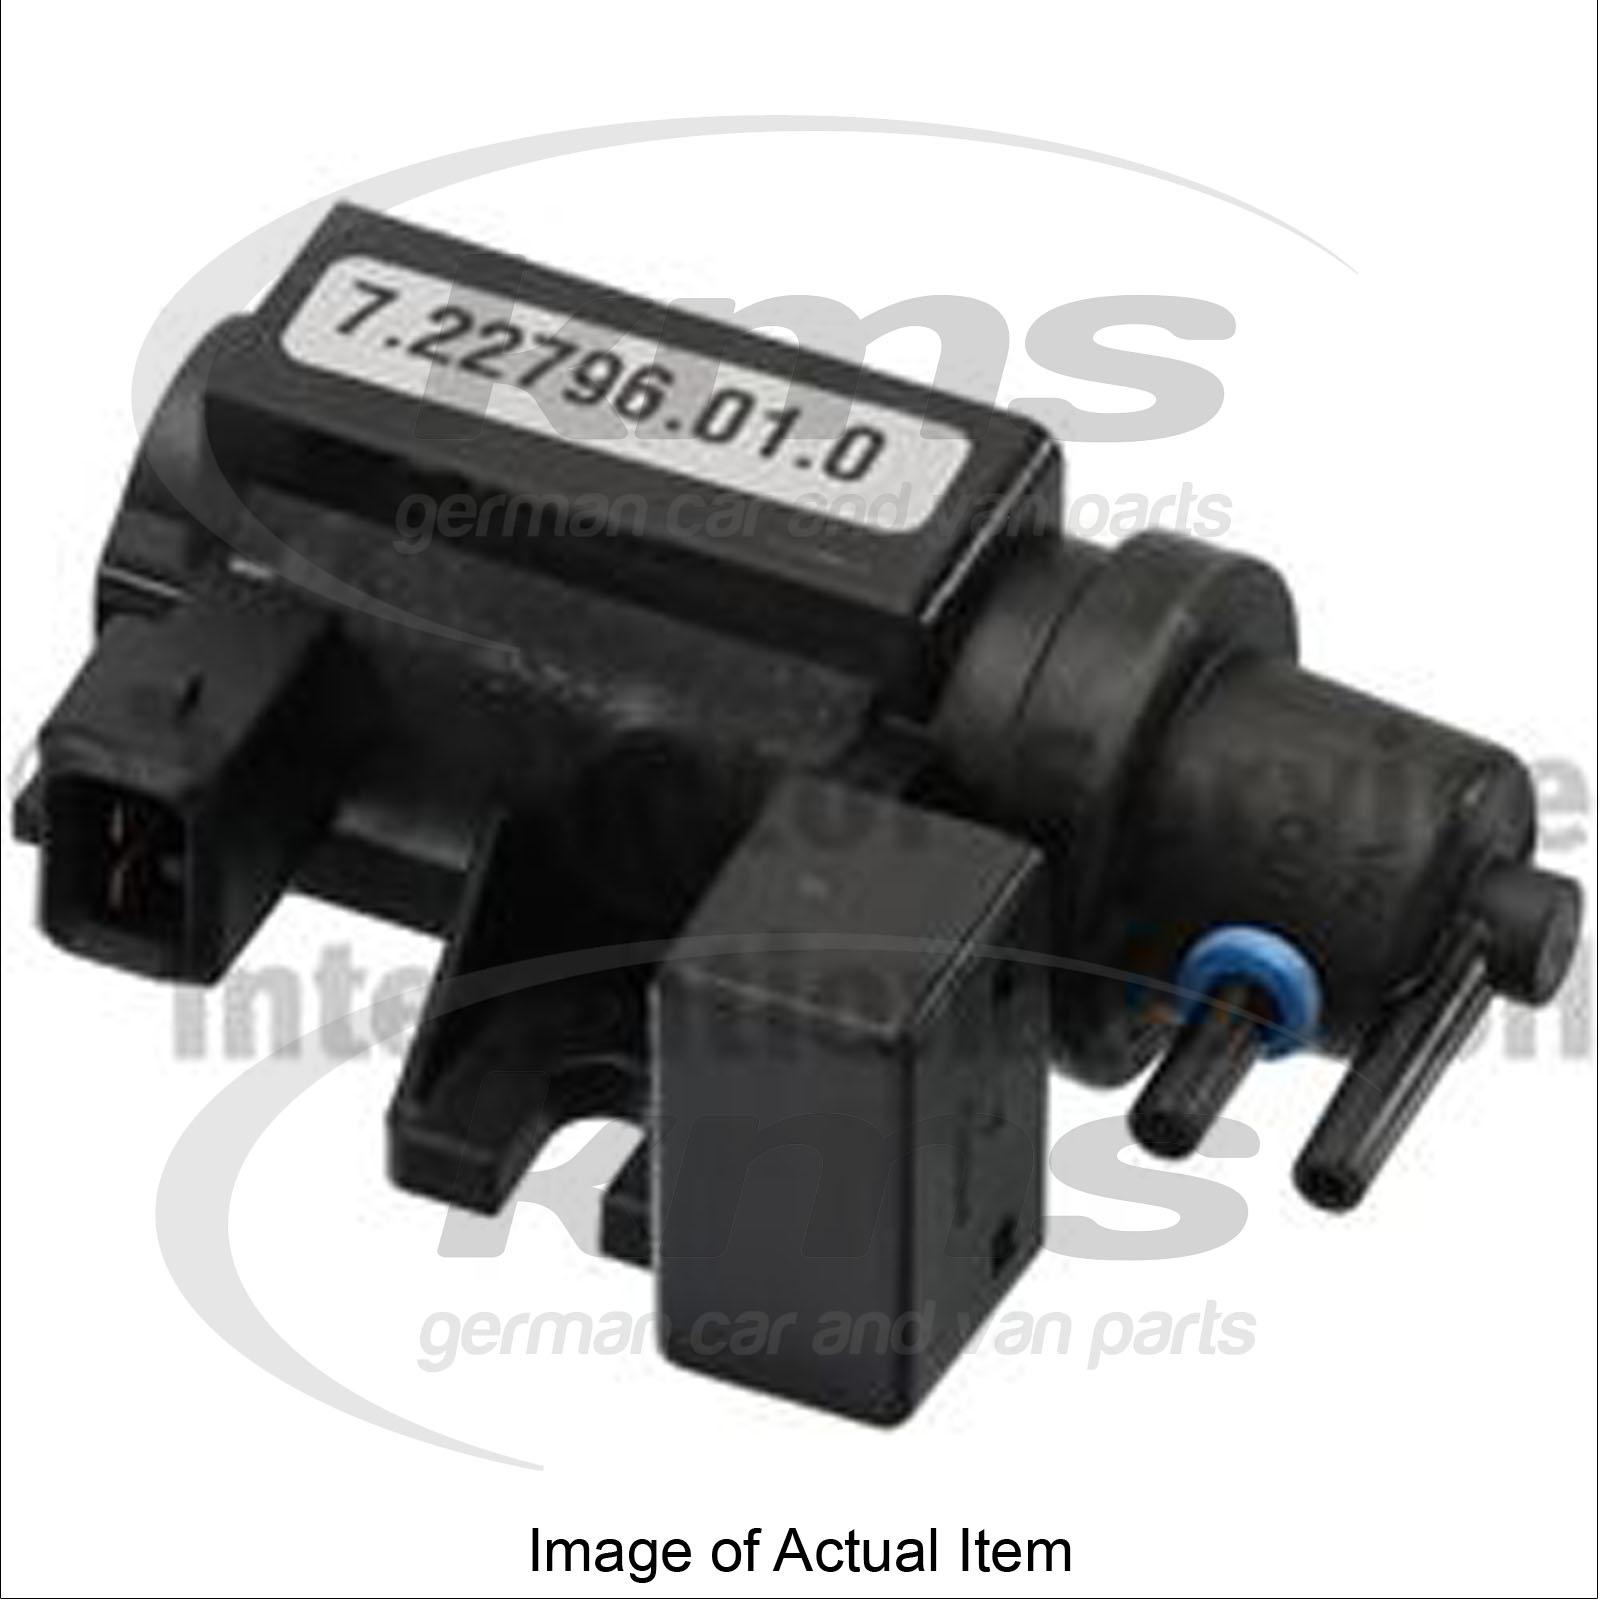 Bmwpressor: Turbocharger Pressure Converter BMW 3 Series Touring (E46